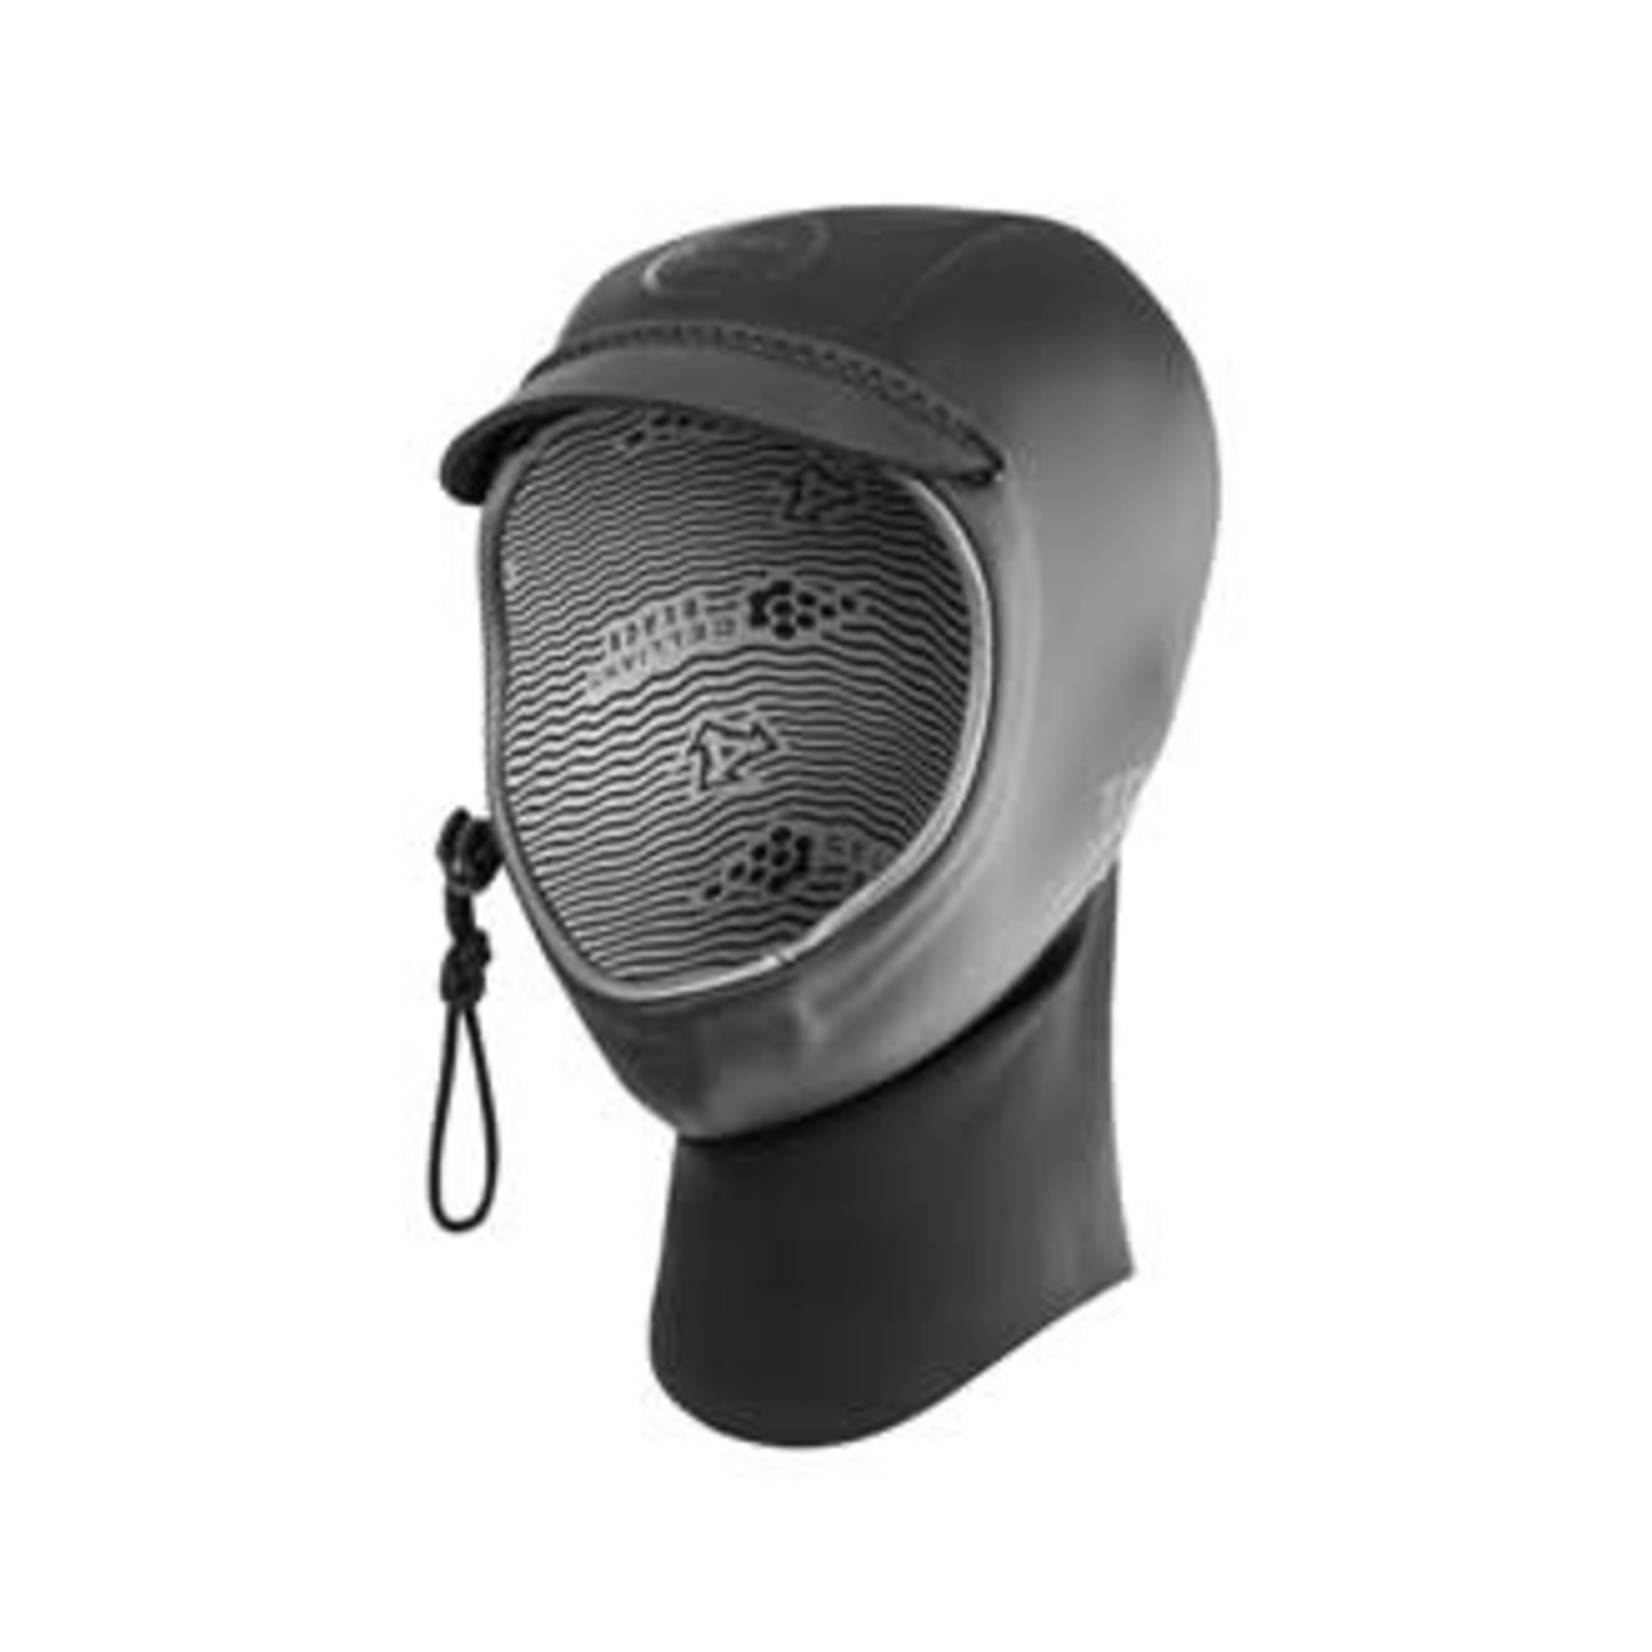 XCEL XCEL Drylock 3mm Hood.